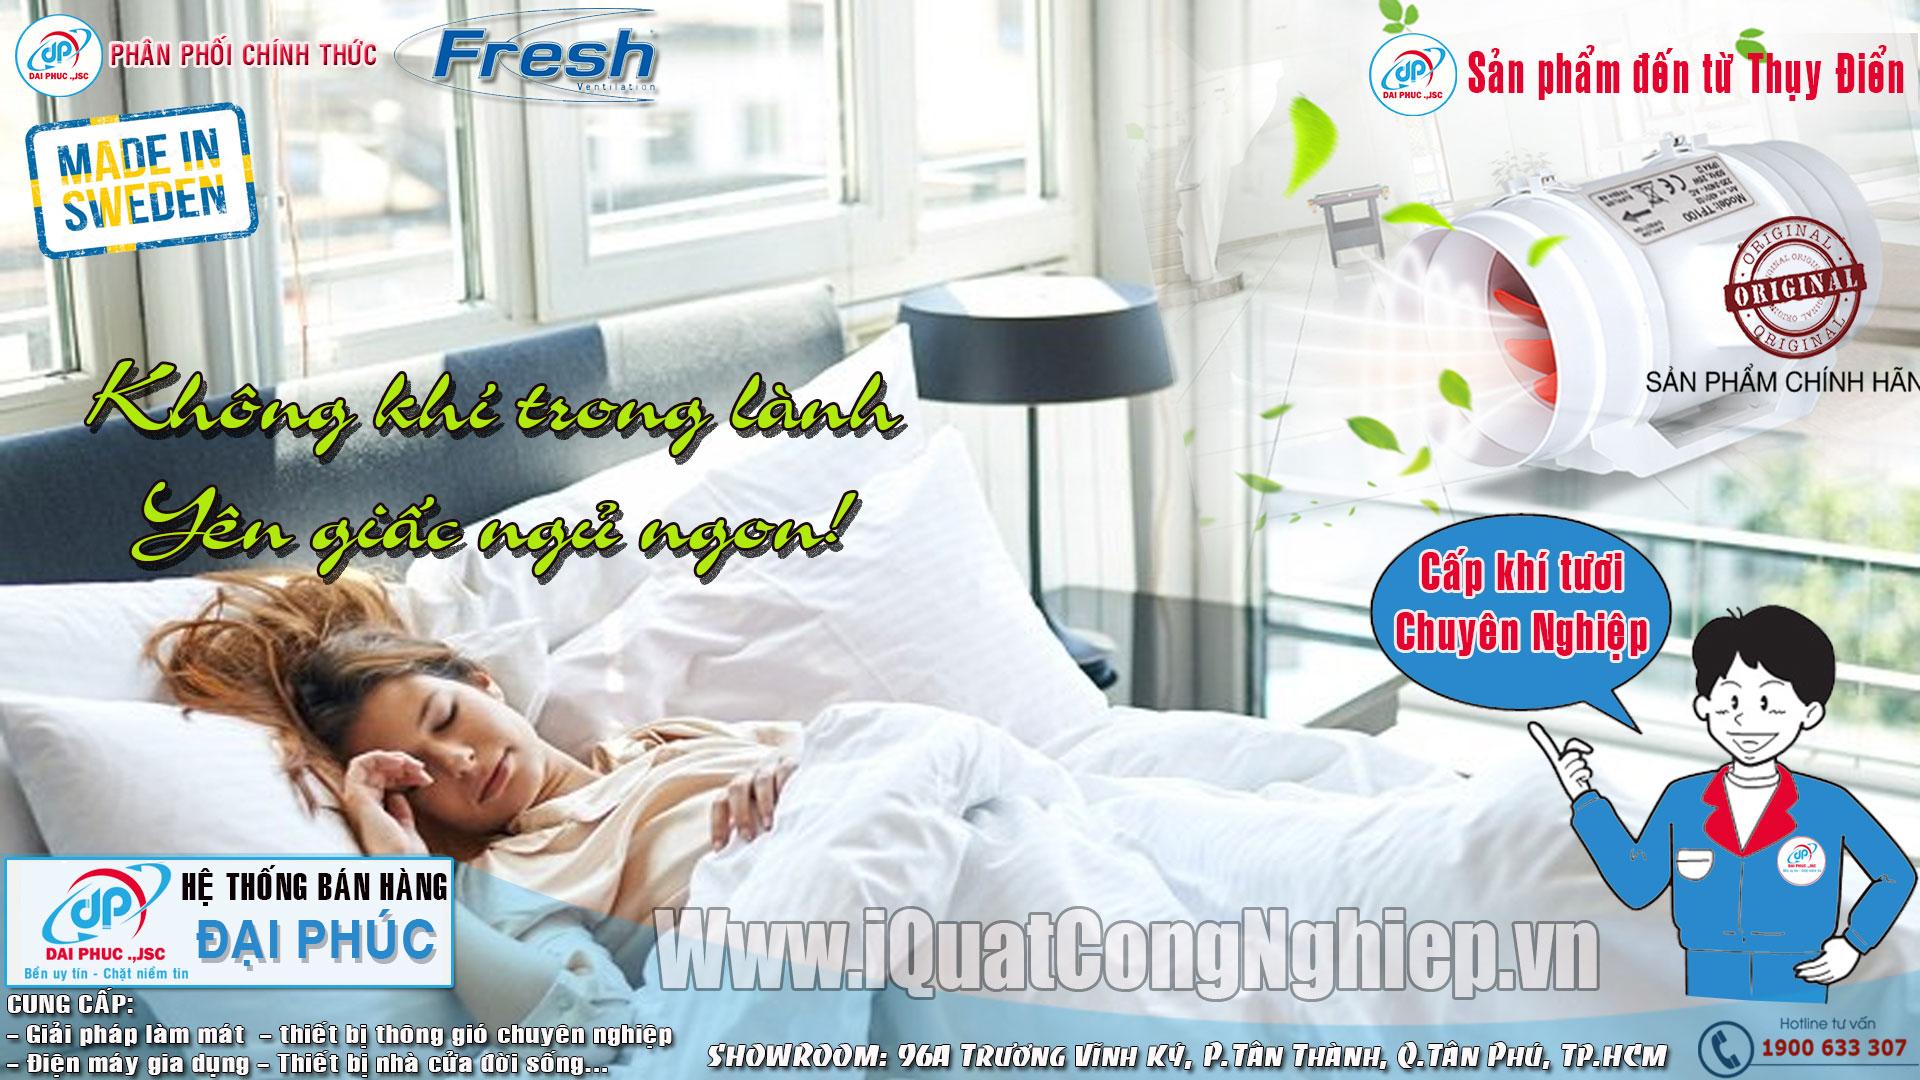 Quat-cap-khi-tuong-fresh-thuy-dien_1